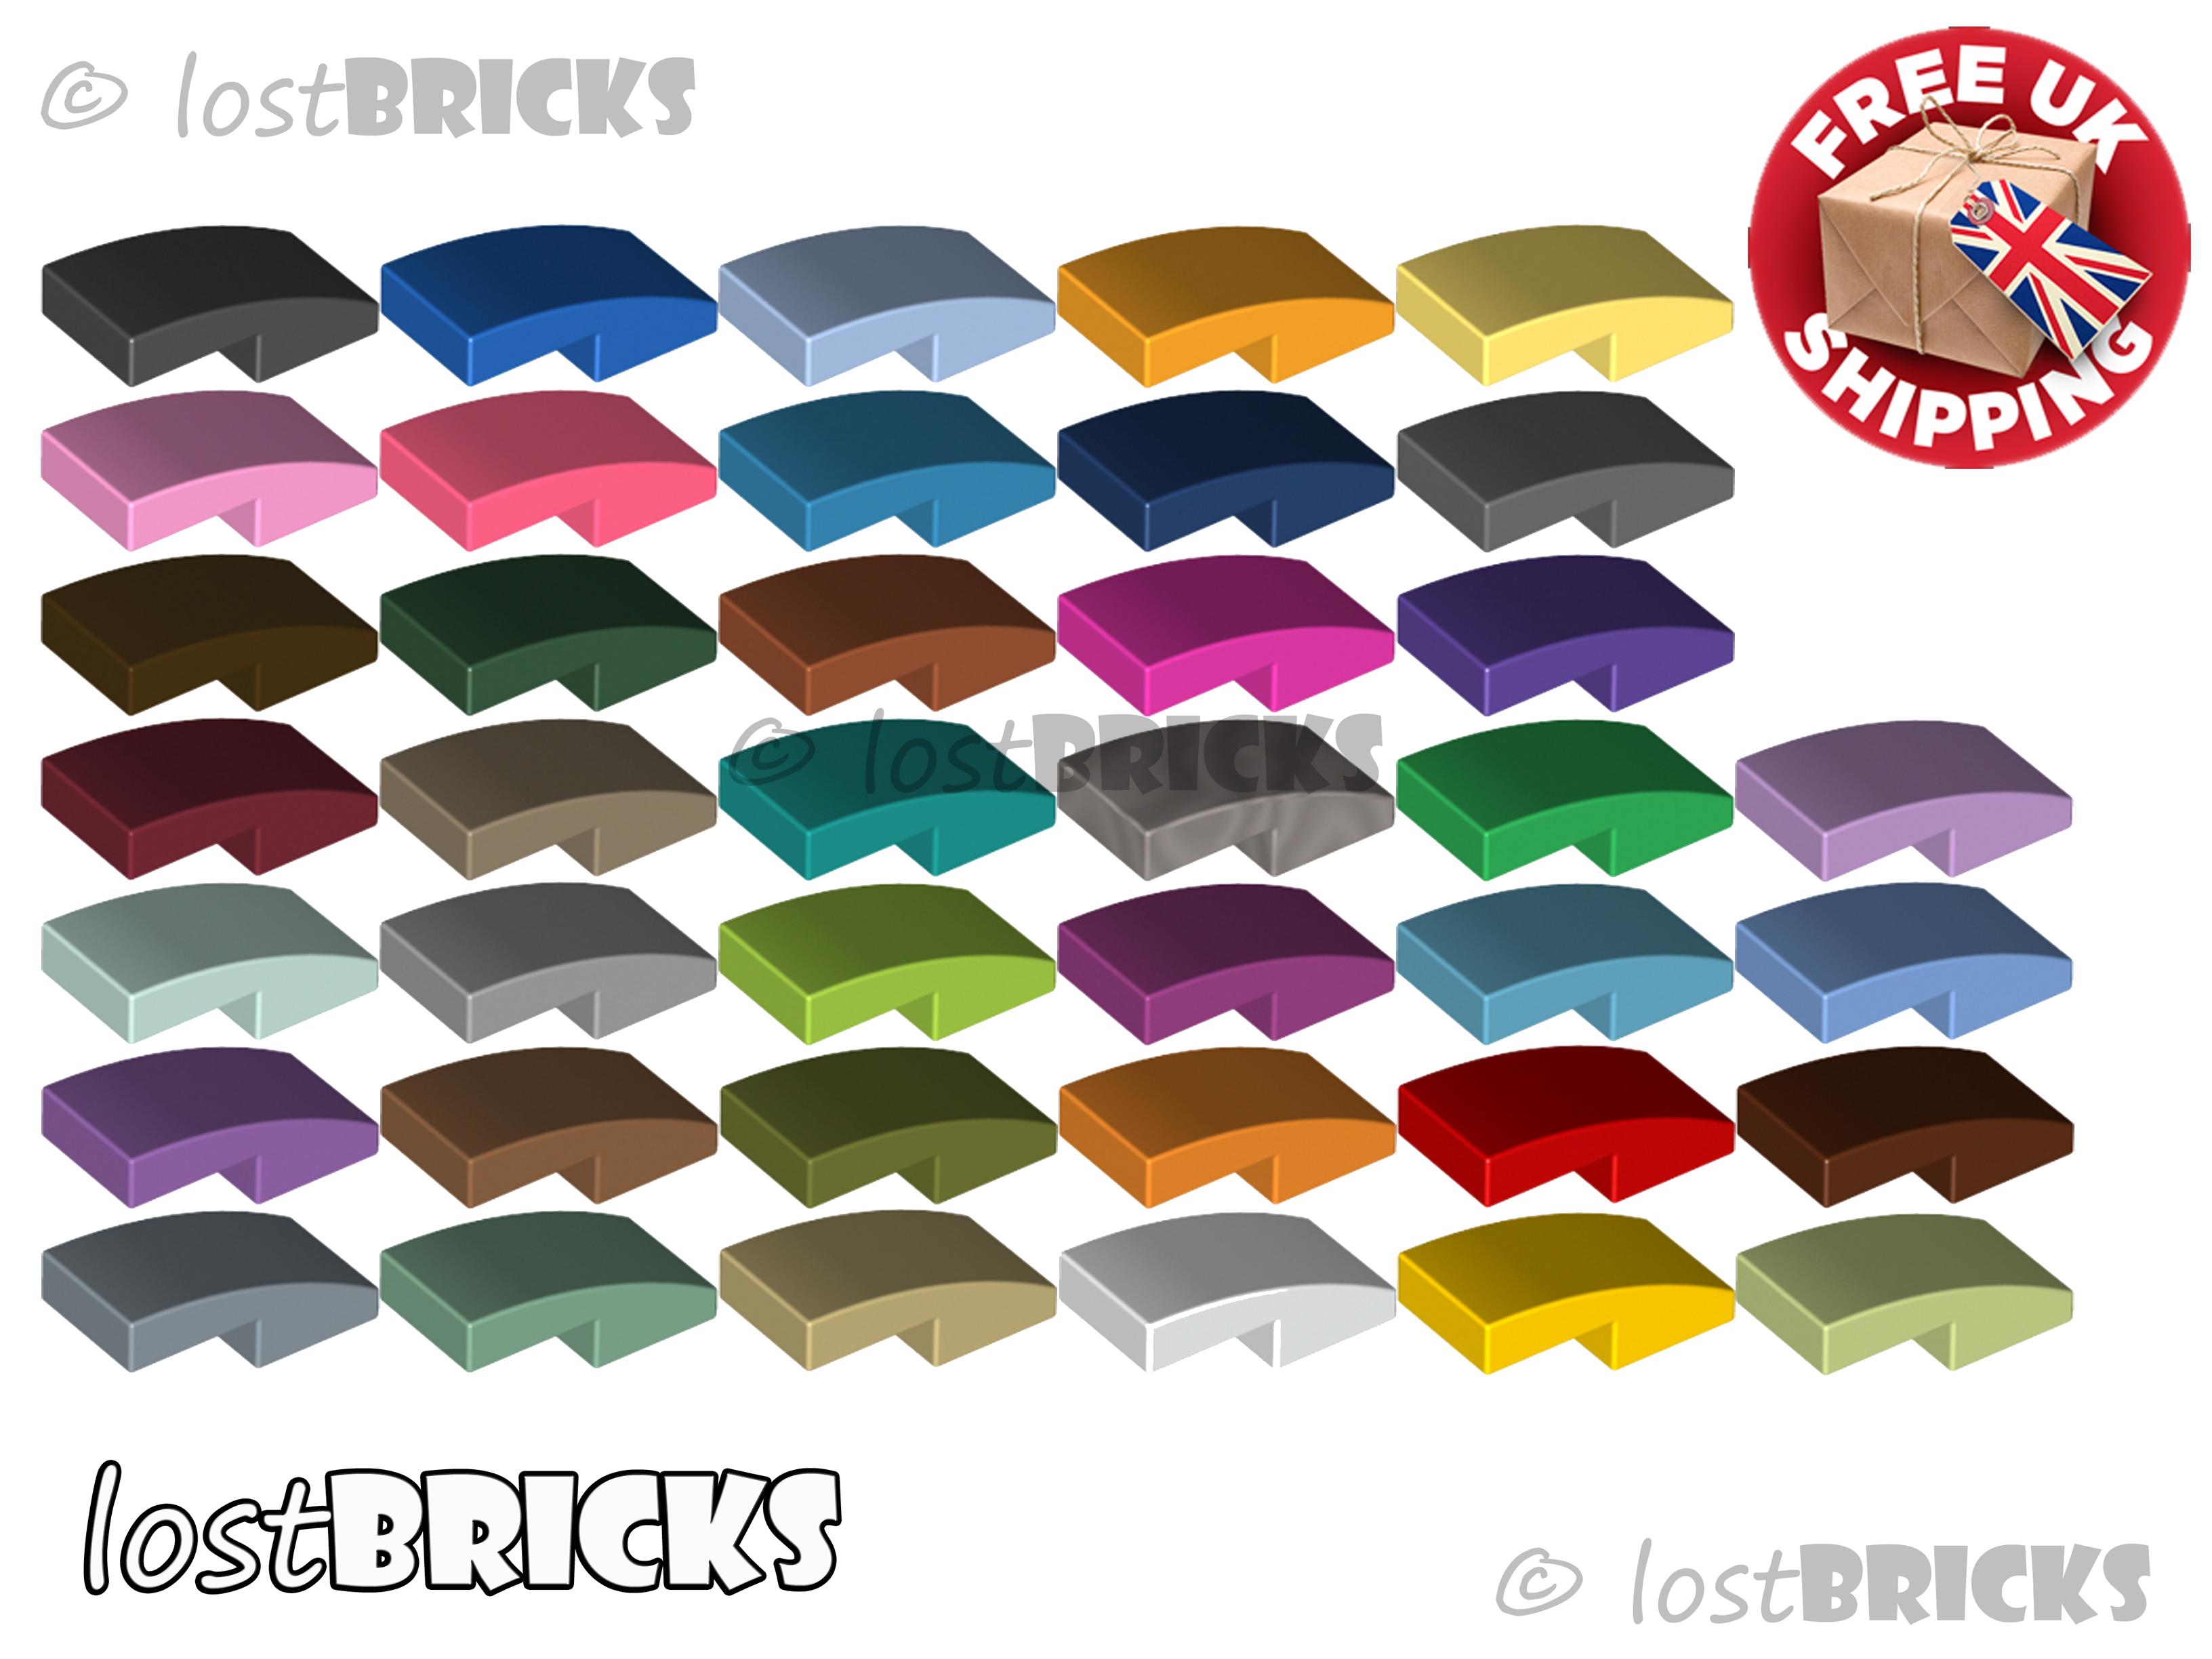 Slope Curved 2x1 No Studs 11477 Choose Color /& Quantity Lego